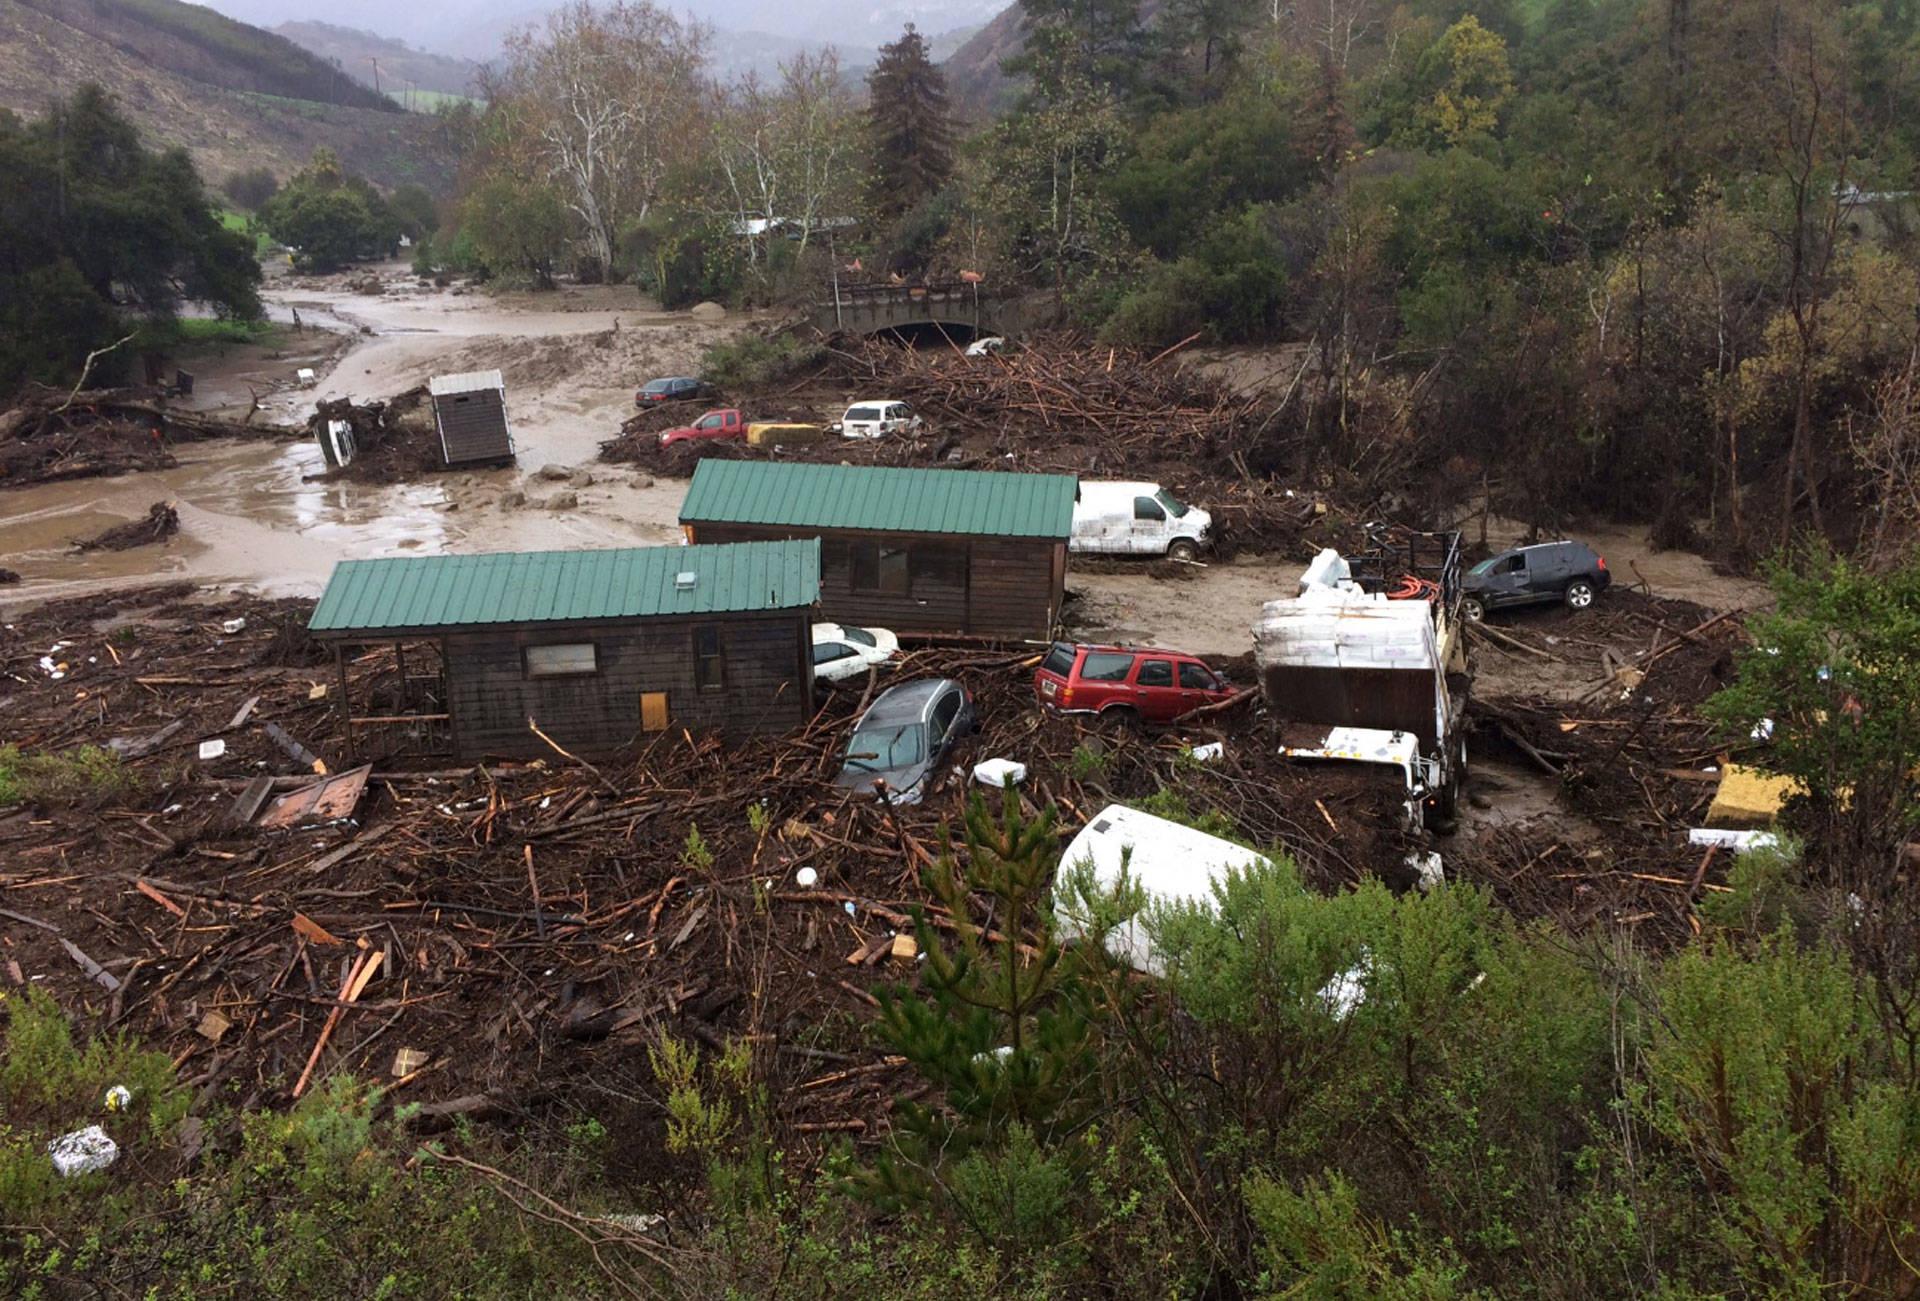 Cabins, Vehicles And Other Debris Were Swept Down El Capitan Canyon Near Santa  Barbara On